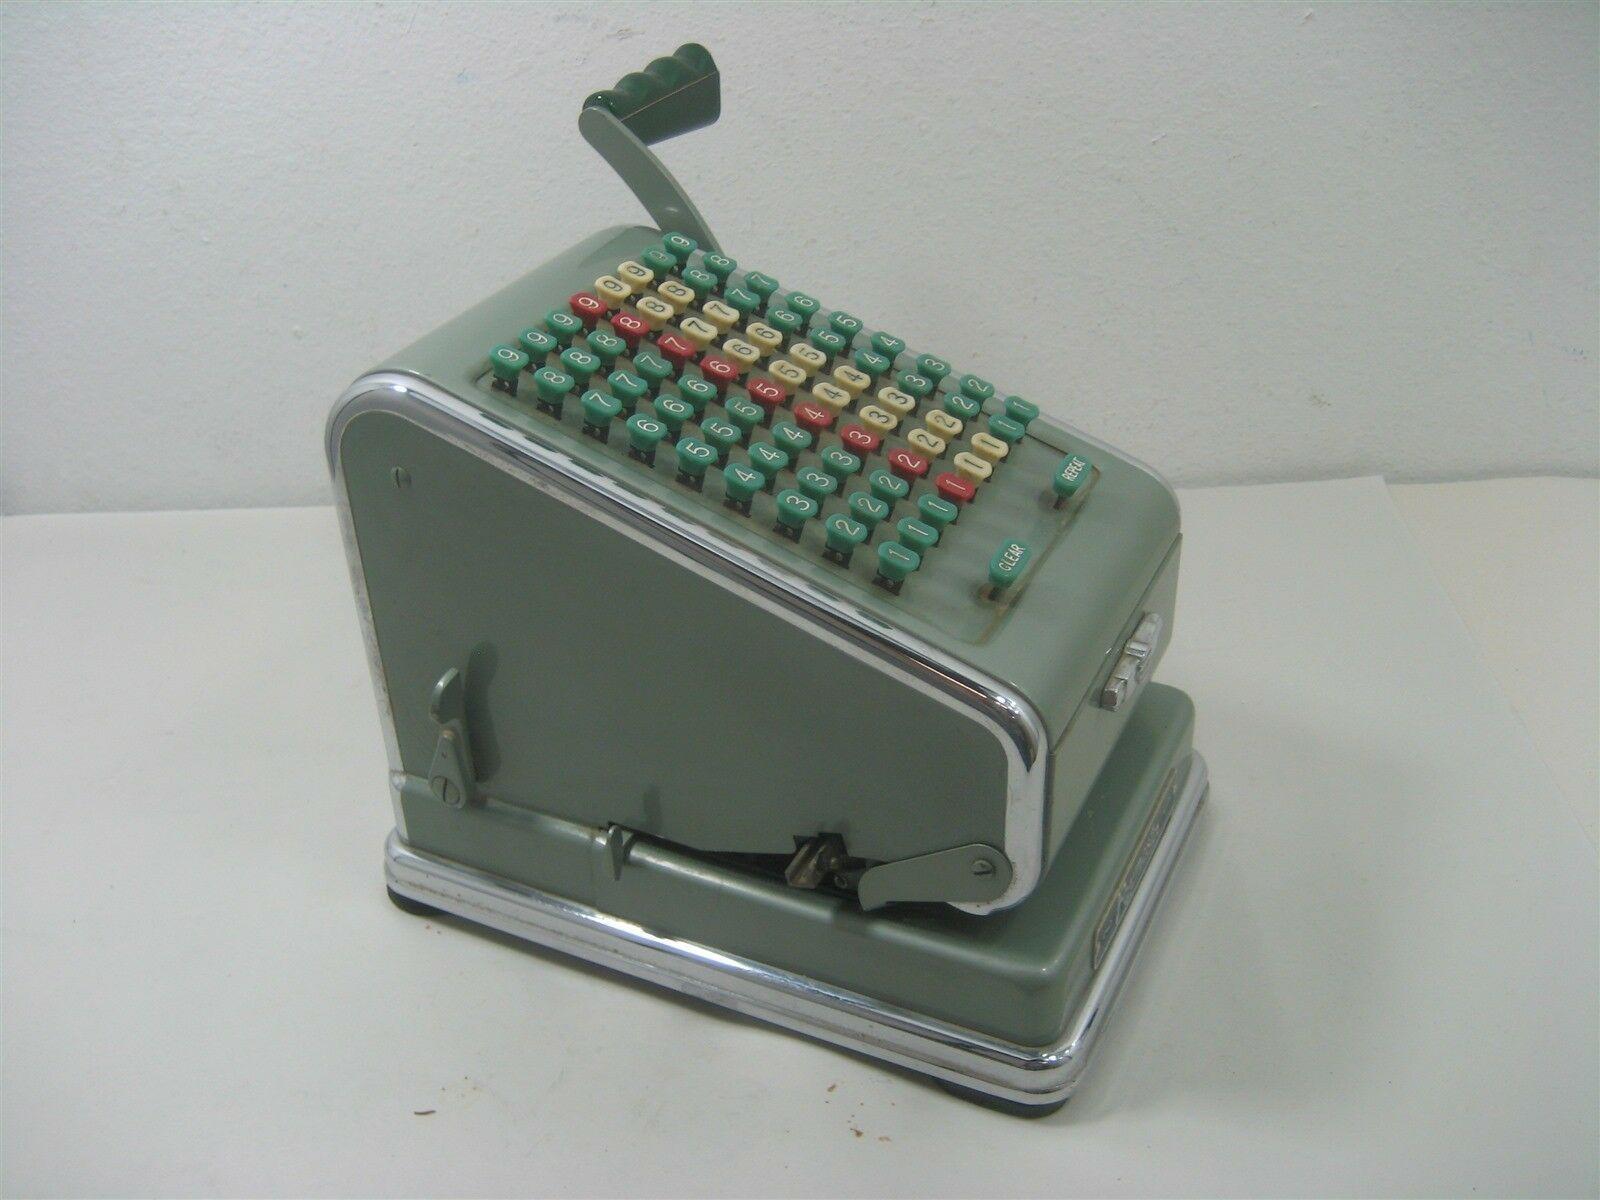 Vintage Antique The Paymaster System 8 Column Keyboard Series 700